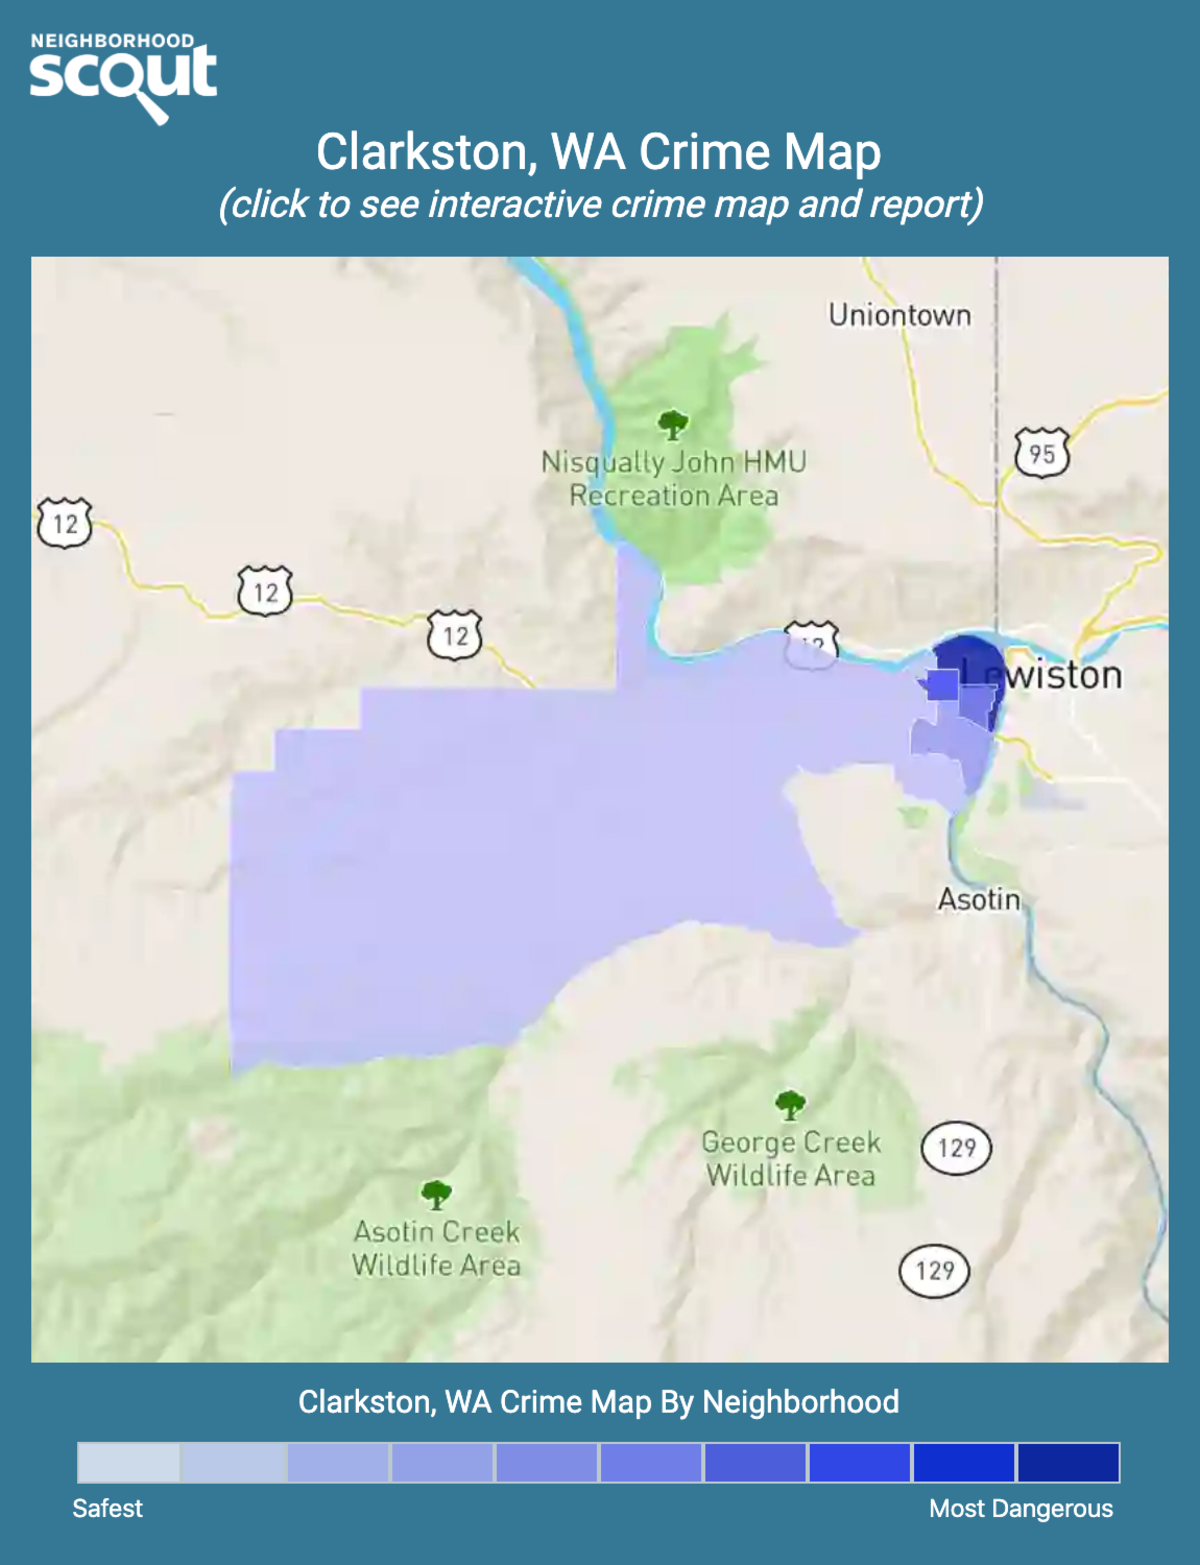 Clarkston, Washington crime map